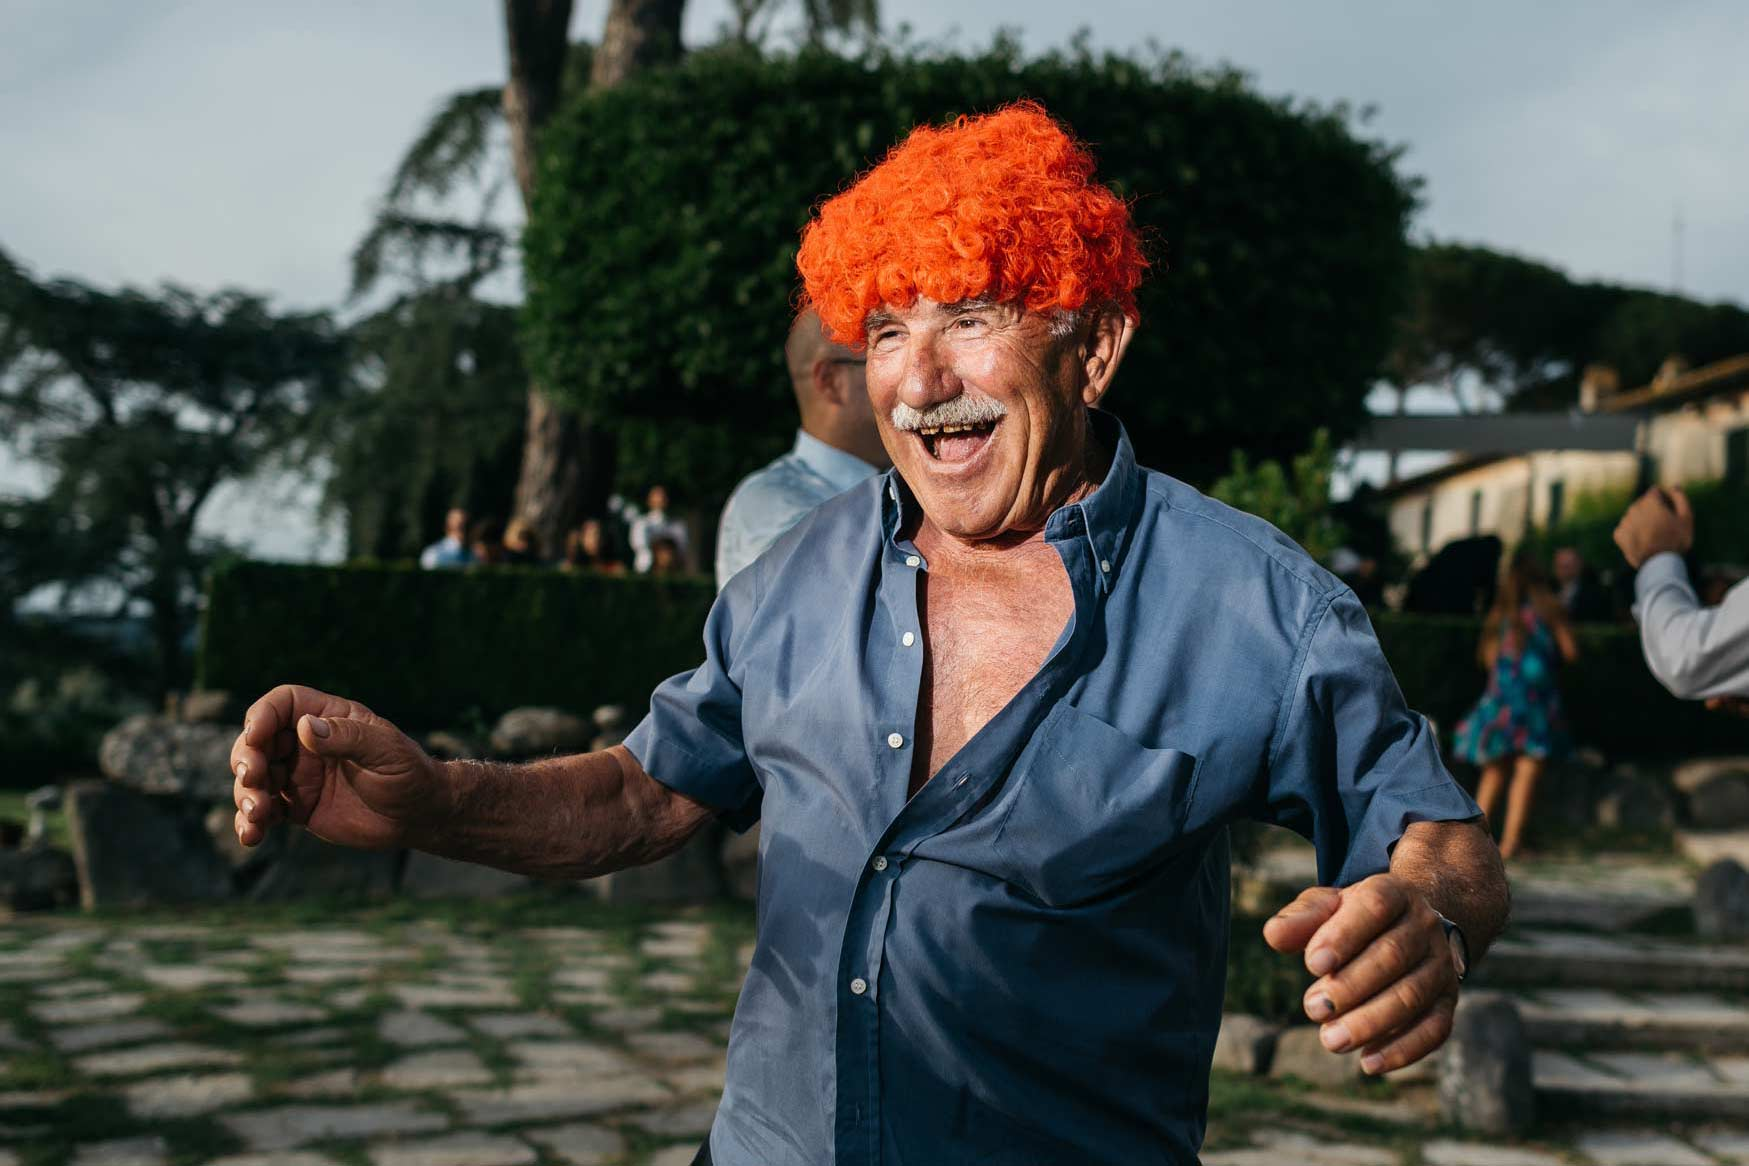 Fotografo-Matrimonio-Roma-Reportage-Simone-Nunzi